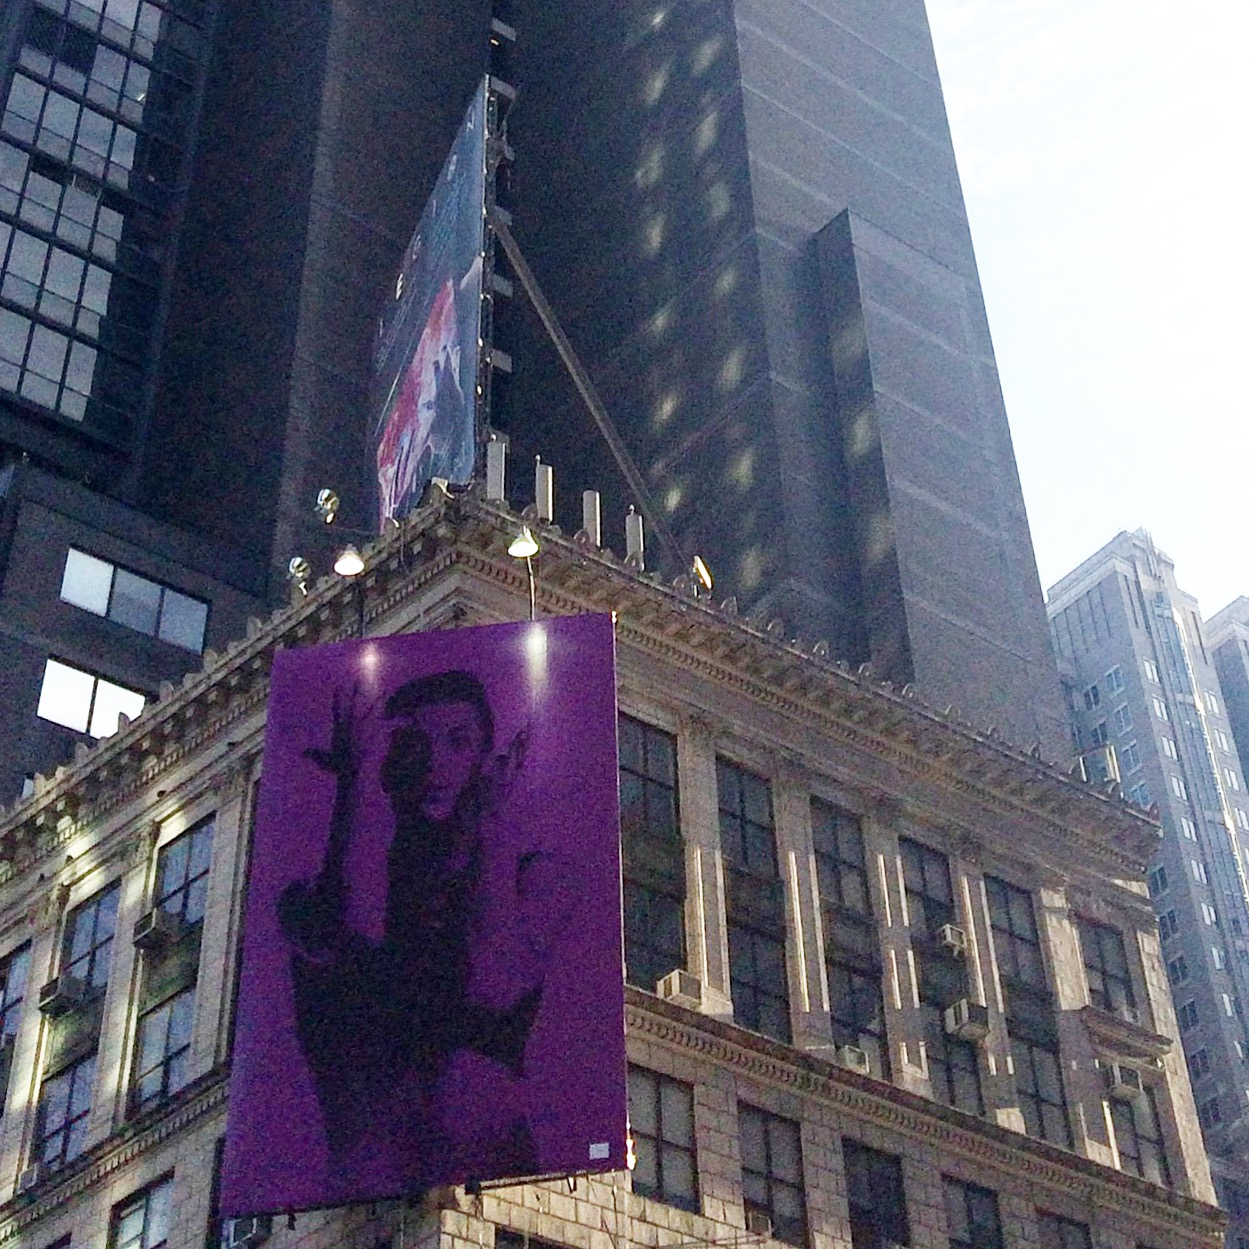 purpleprince.JPG